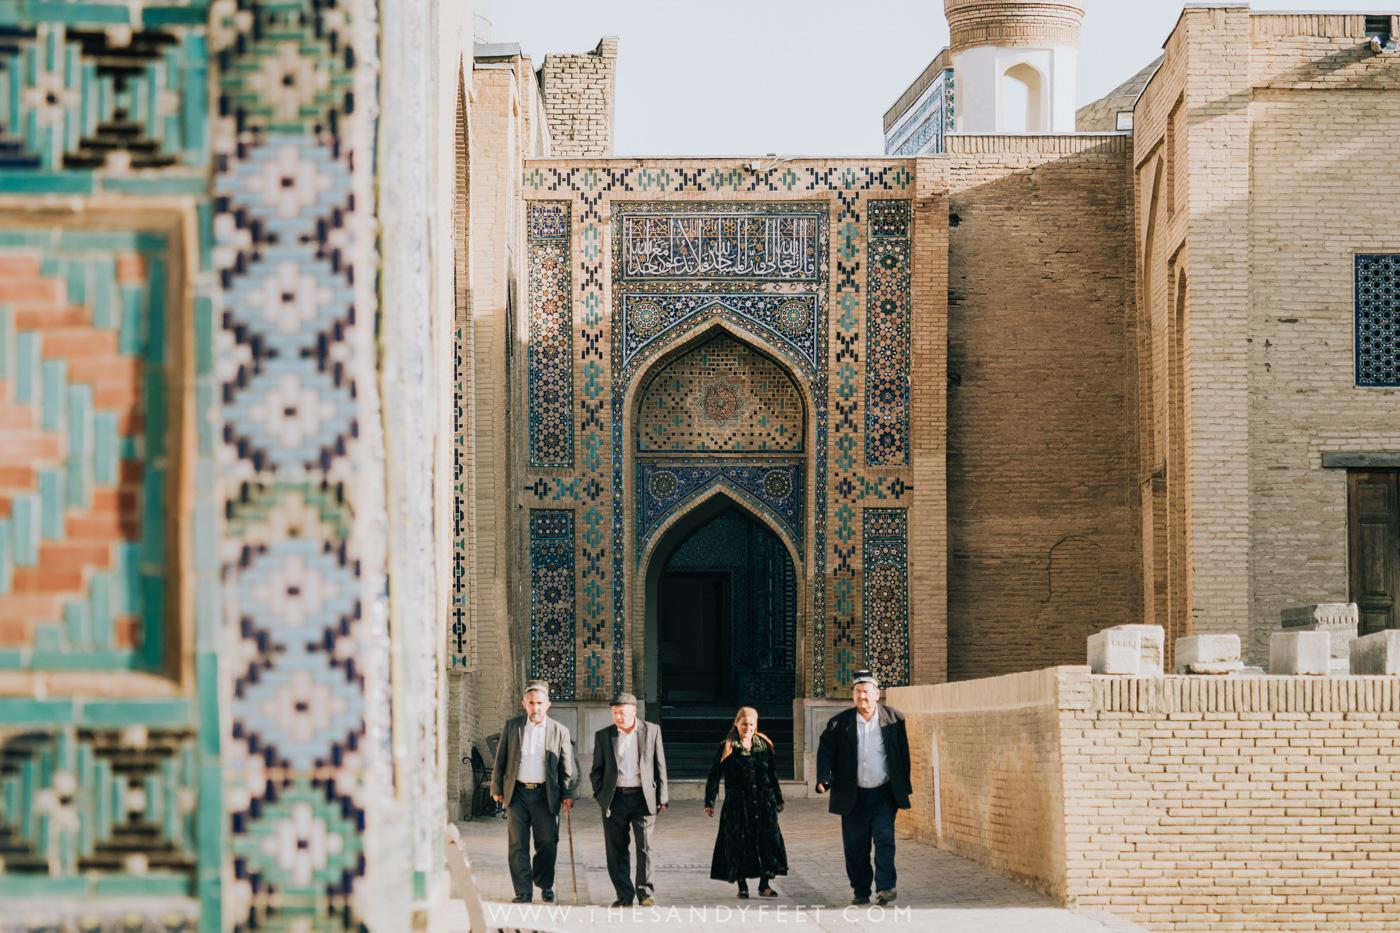 Arriving at Shah-I-Zinda | Samarkand Travel Guide: The Best Things To Do In Samarkand, Uzbekistan